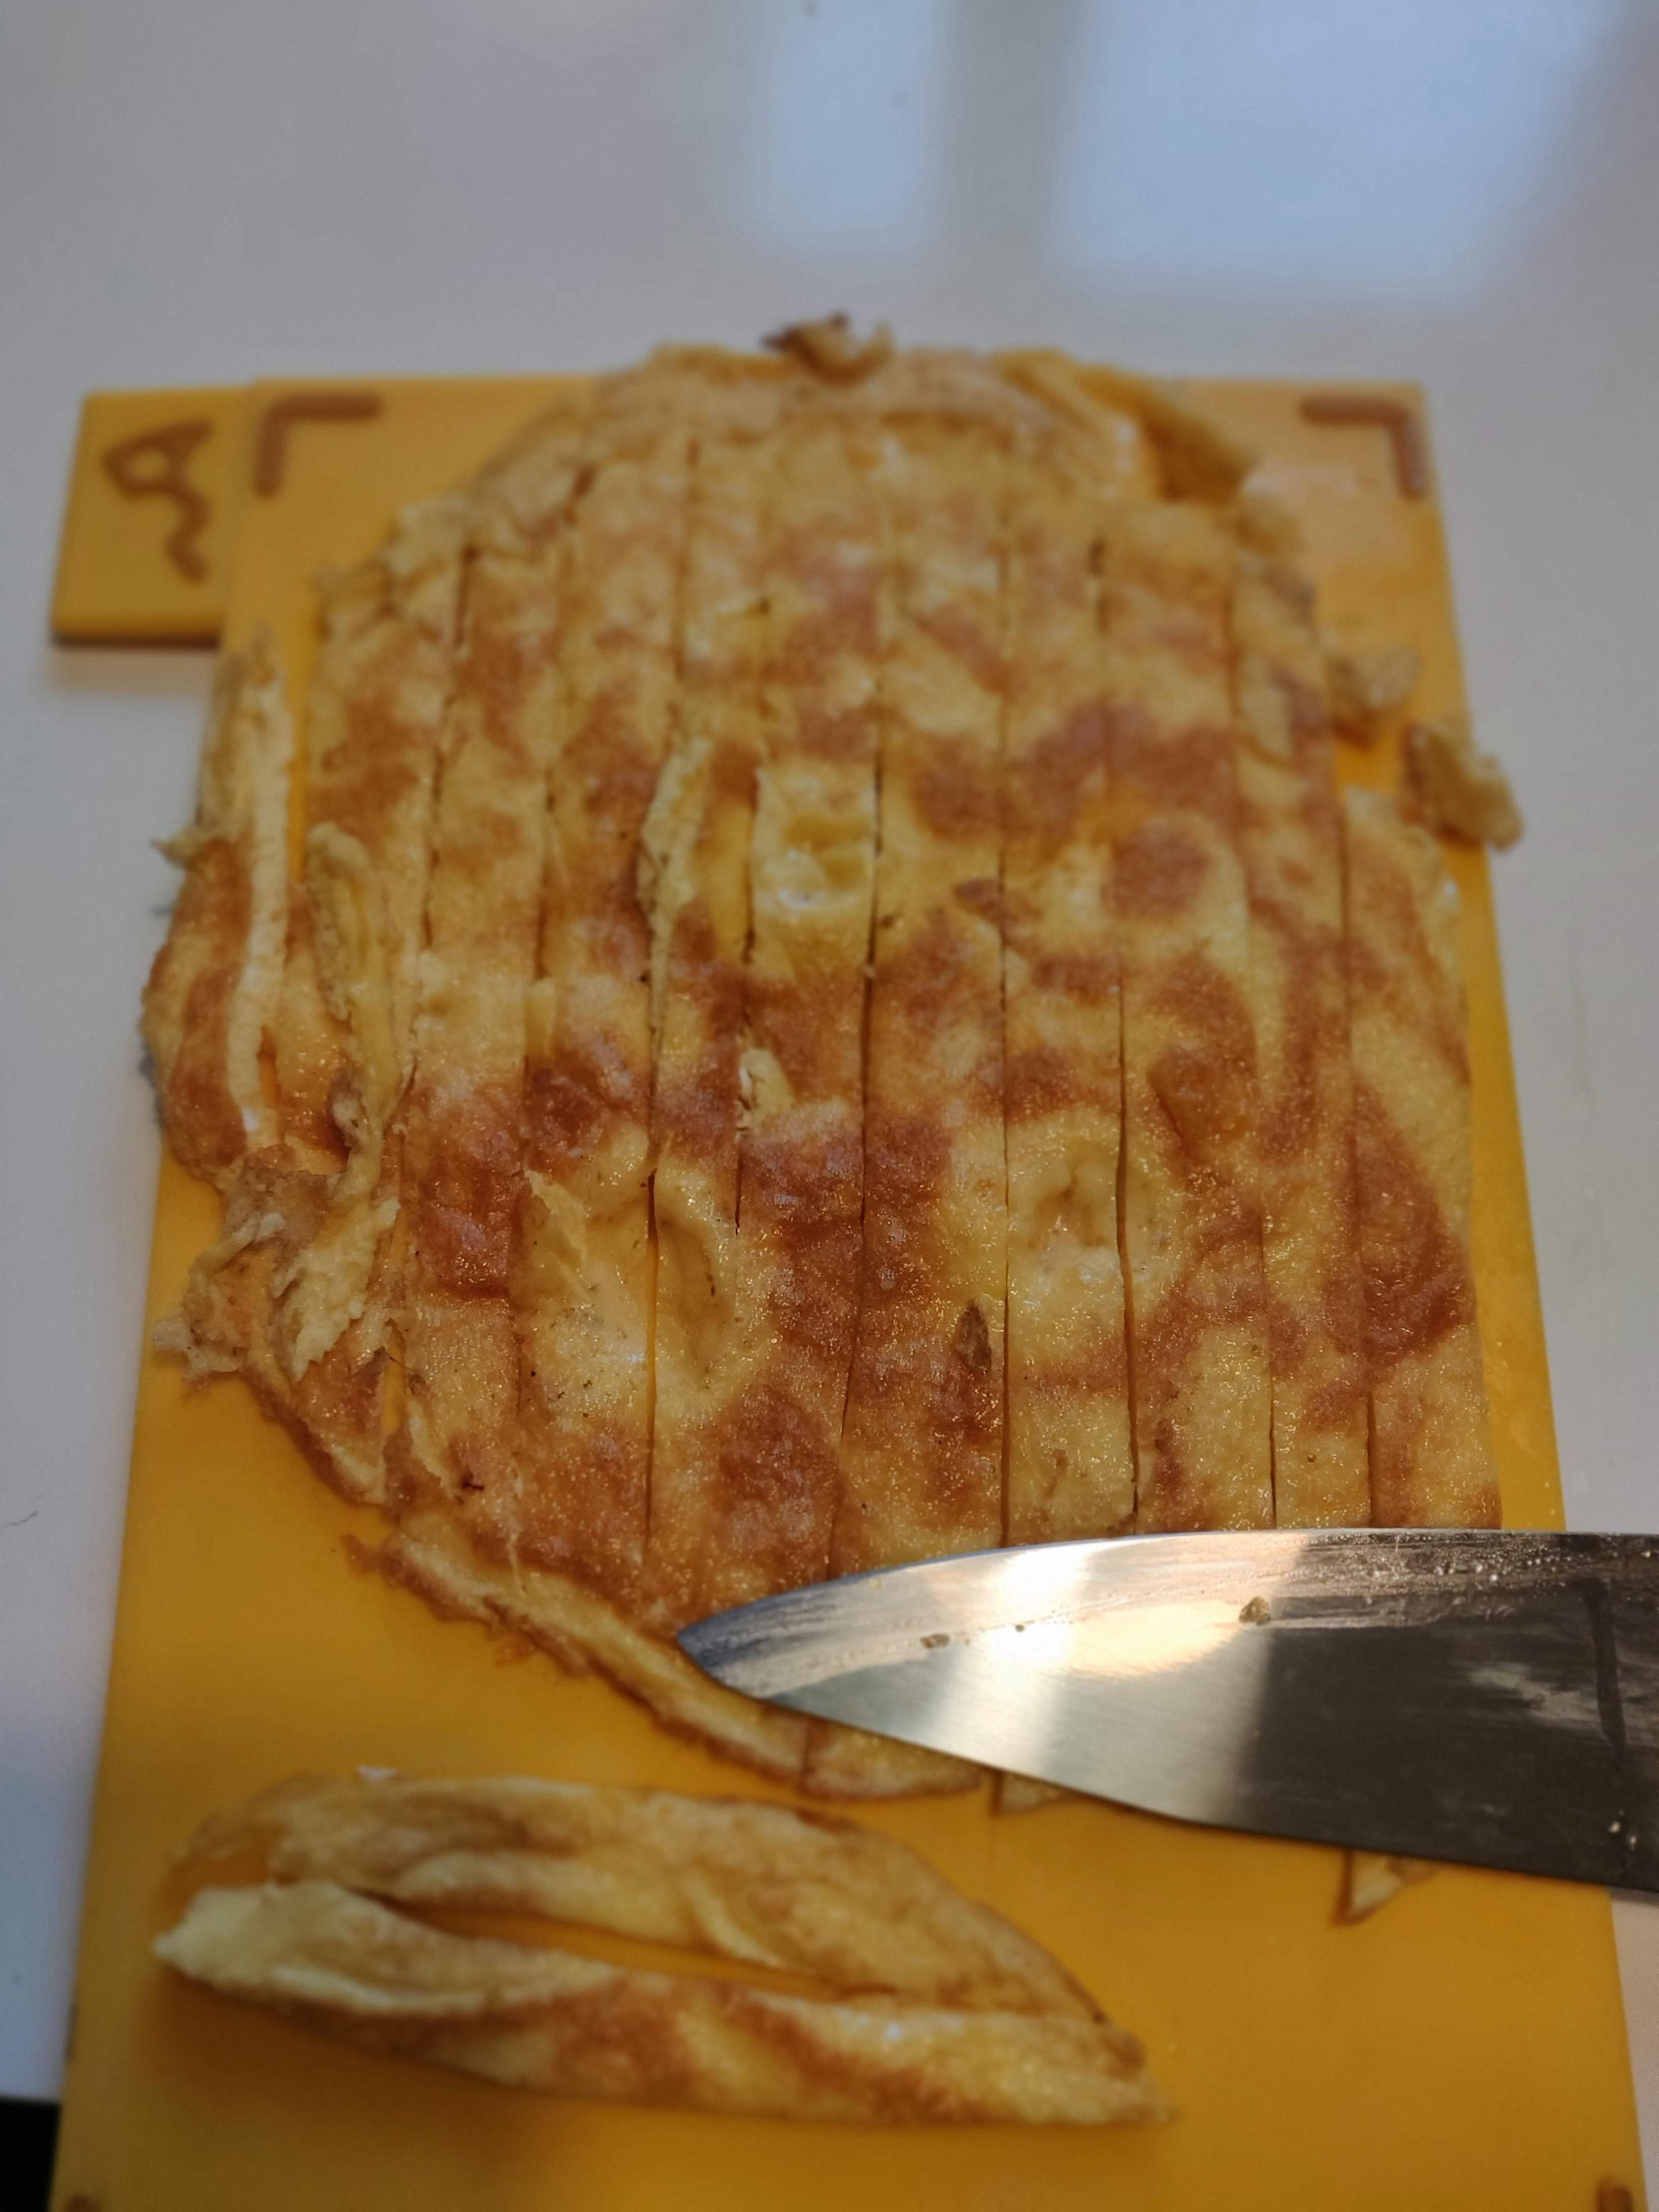 Thin slice the omelette